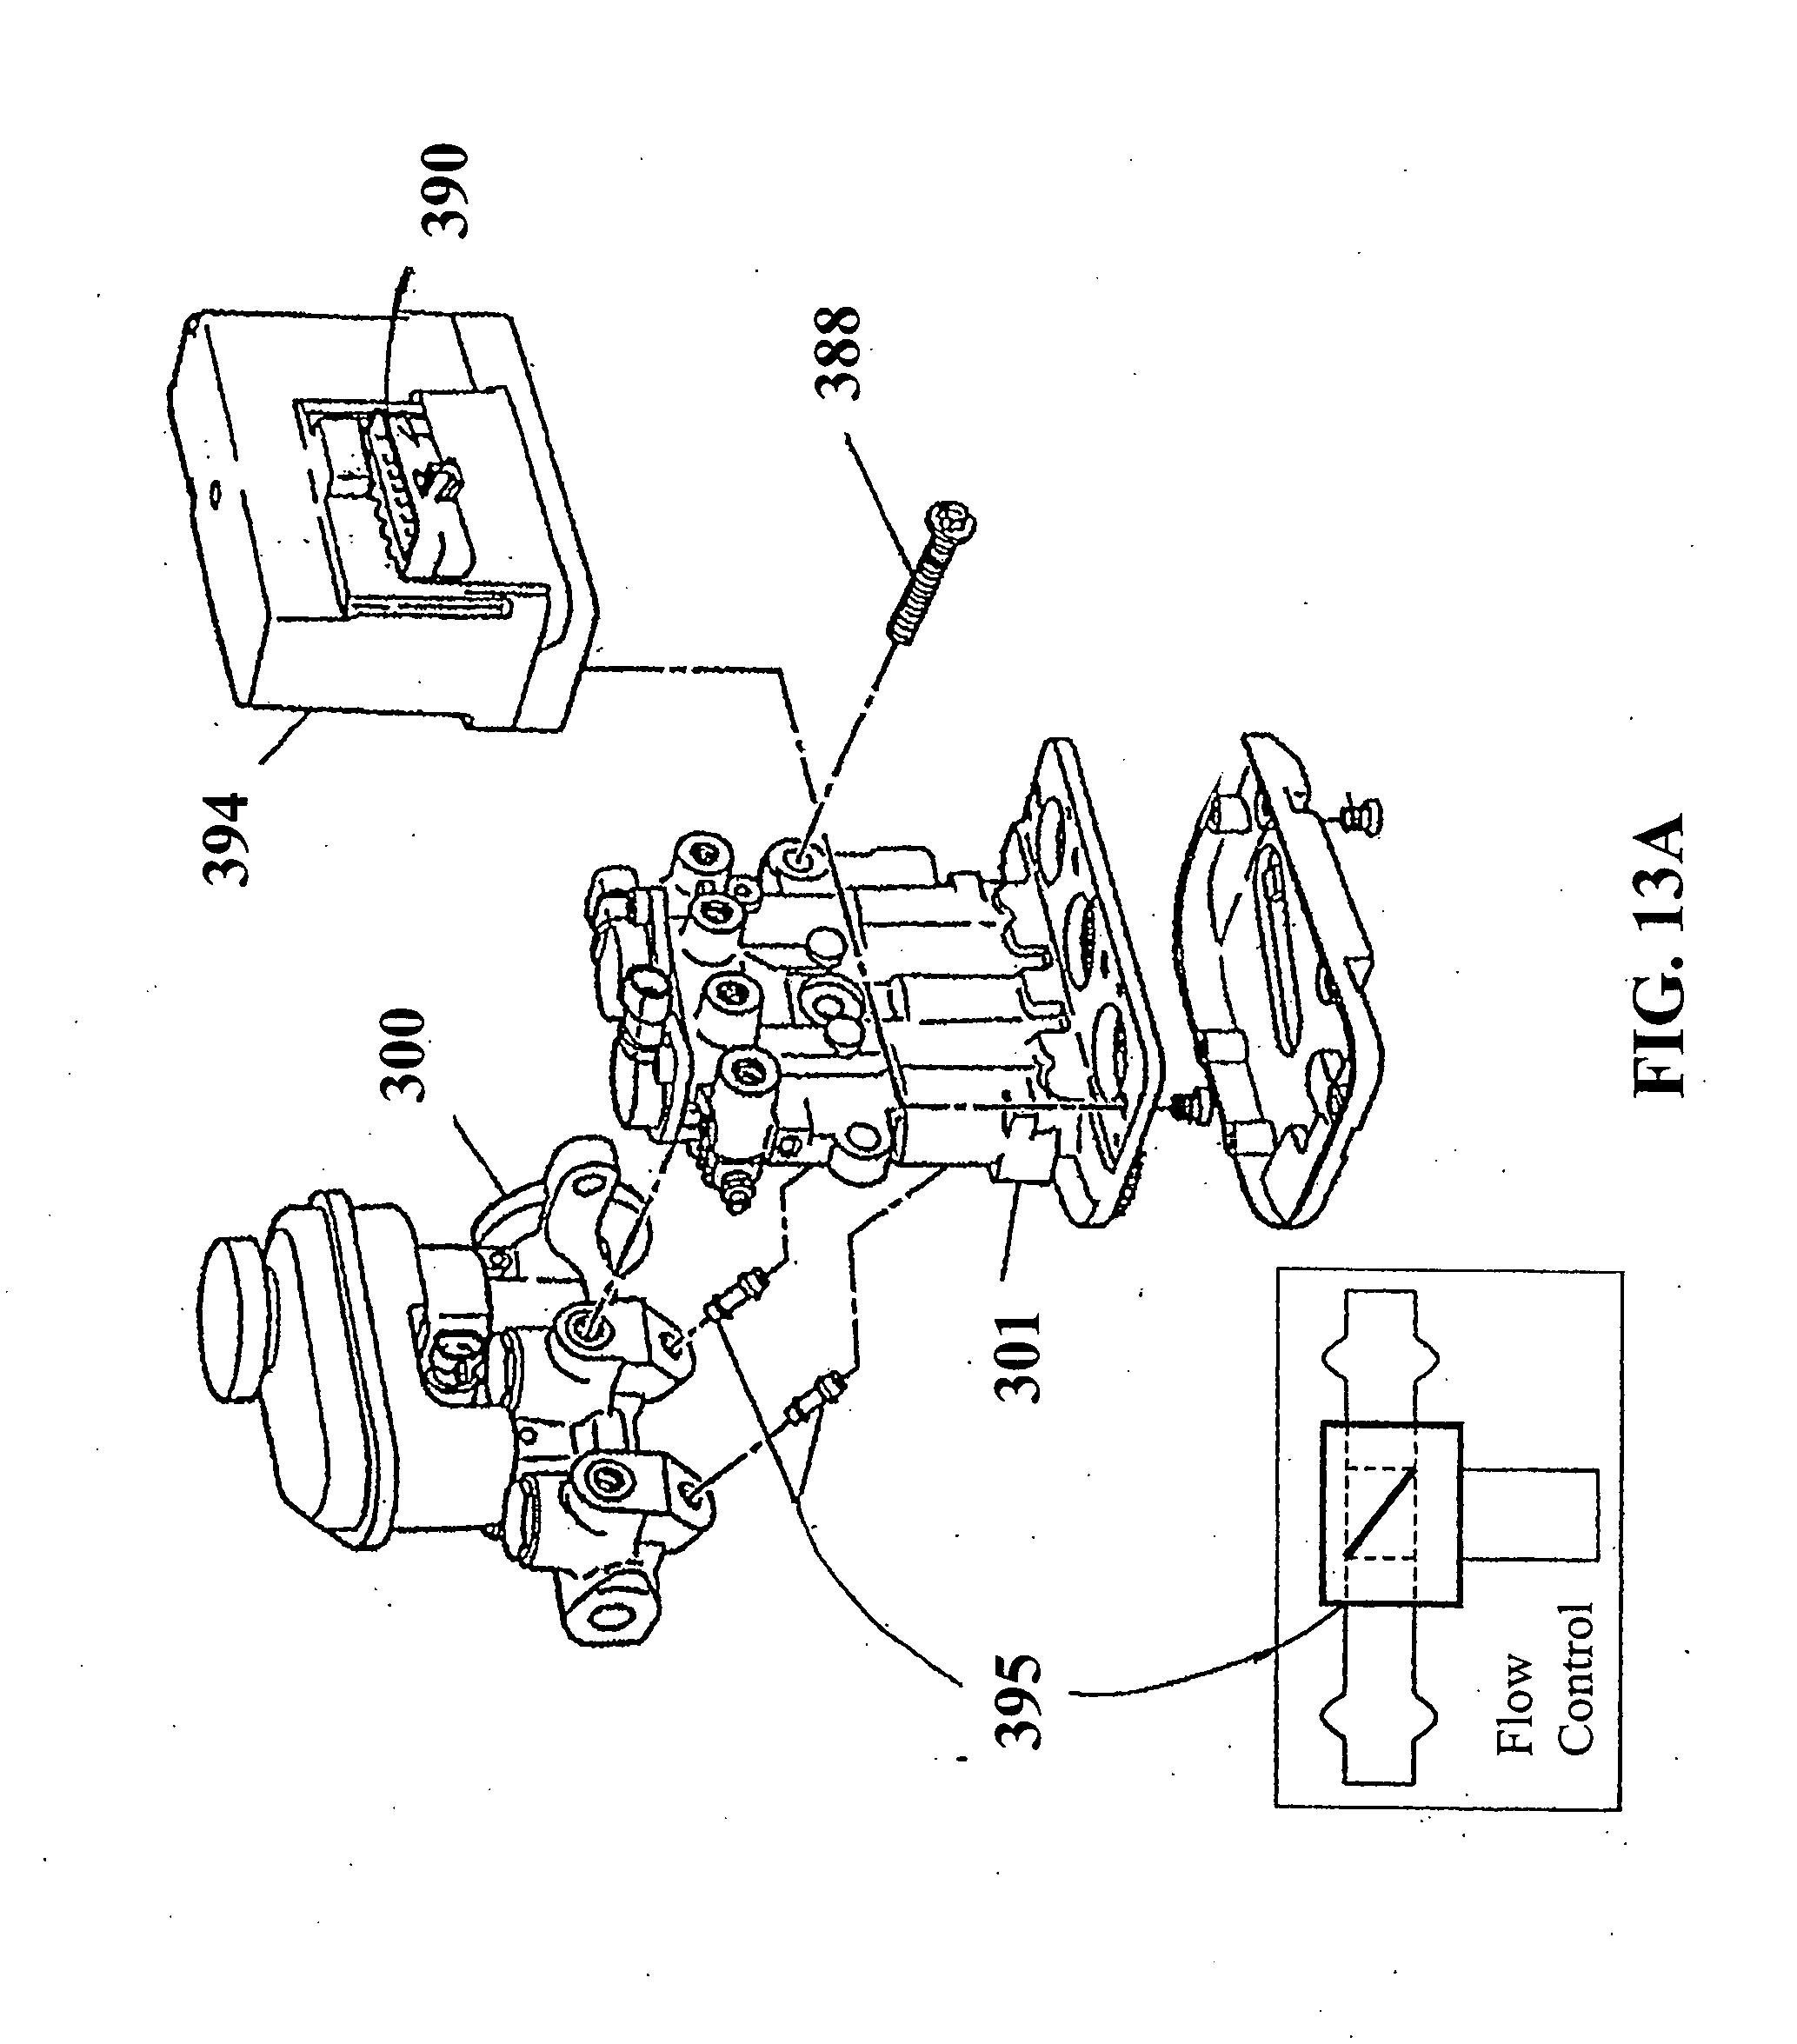 Ford Focus Tps Sensor Diagram Free Engine